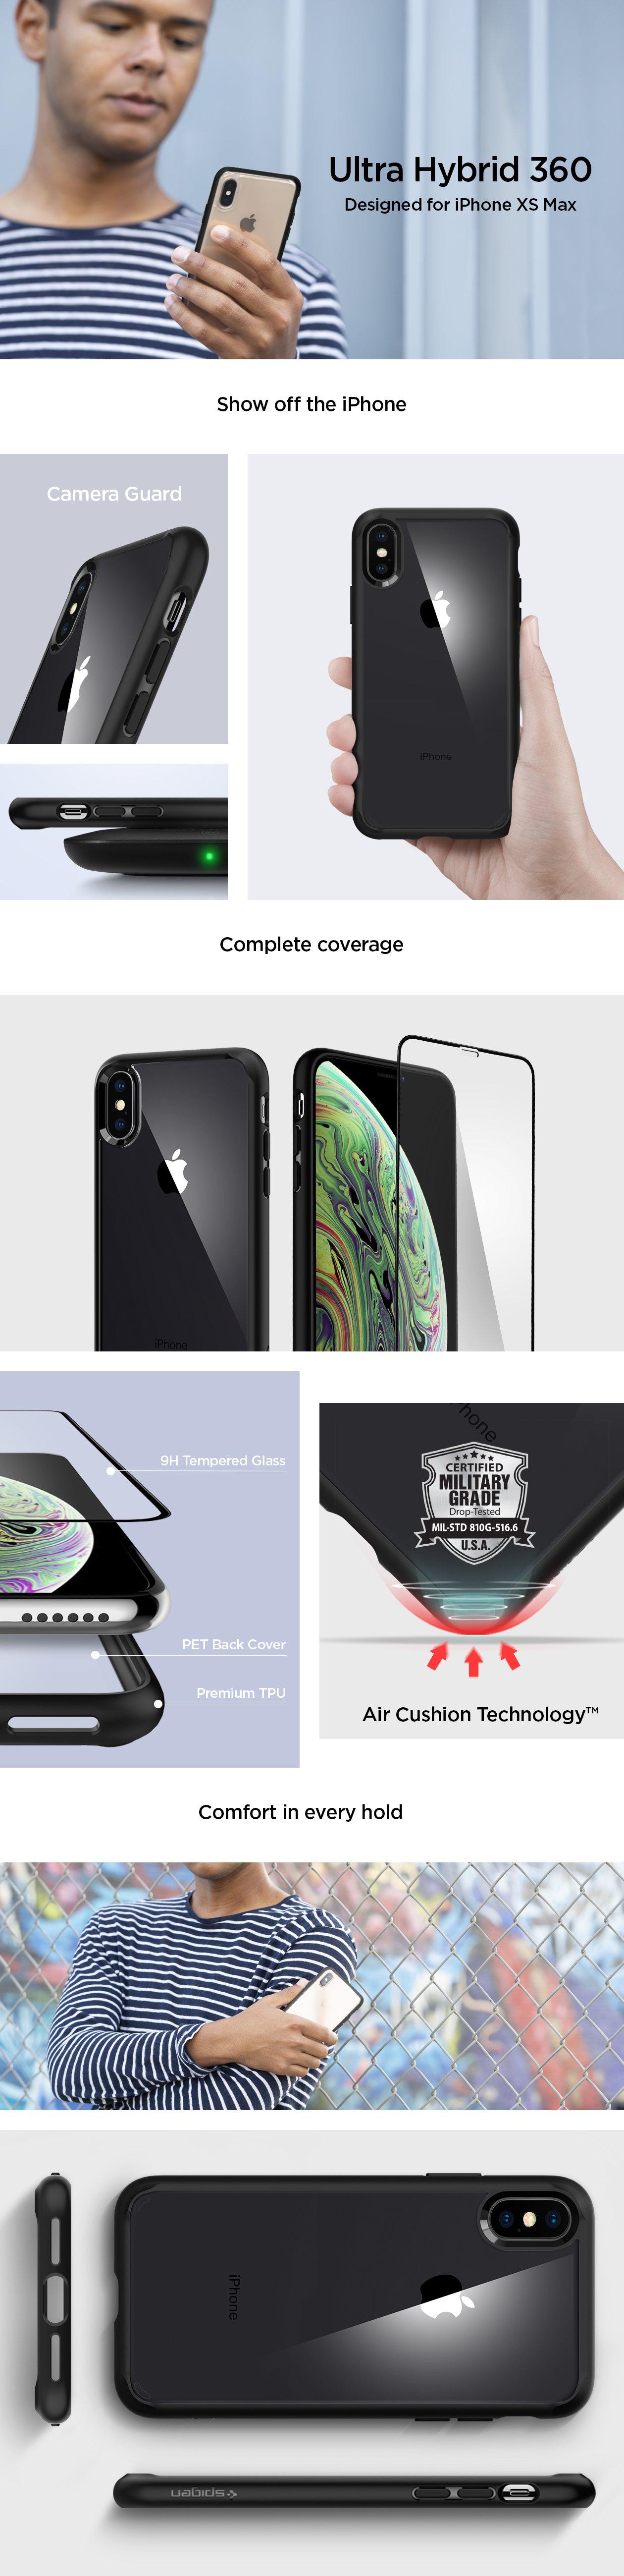 Vlastnosti obalu, krytu a pouzdra Spigen Ultra Hybrid 360 pro Apple iPhone XS MAX.